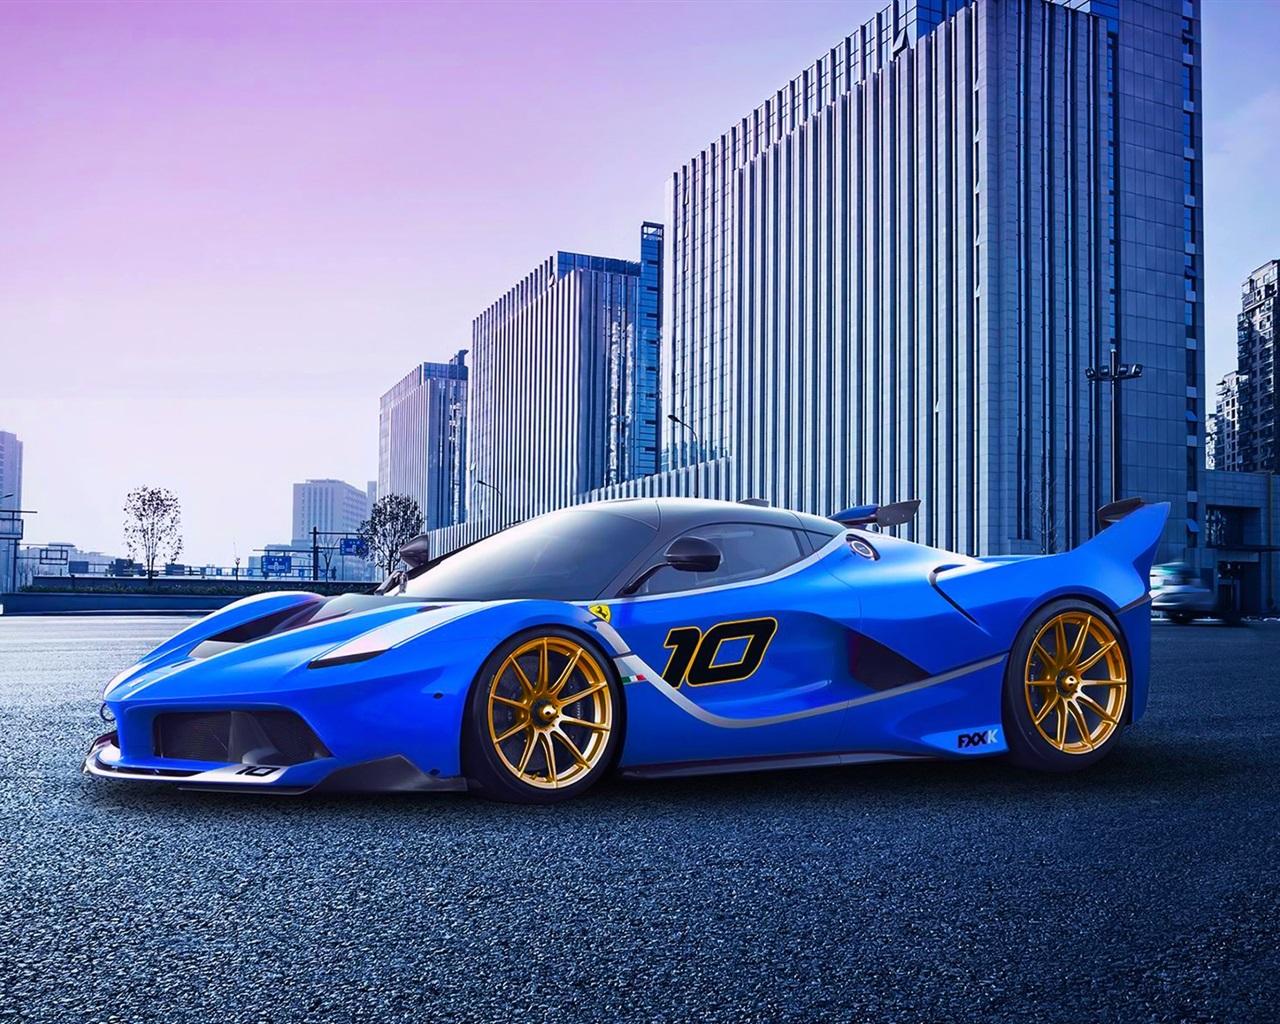 Ferrari Laferrari Wallpaper Hd Download